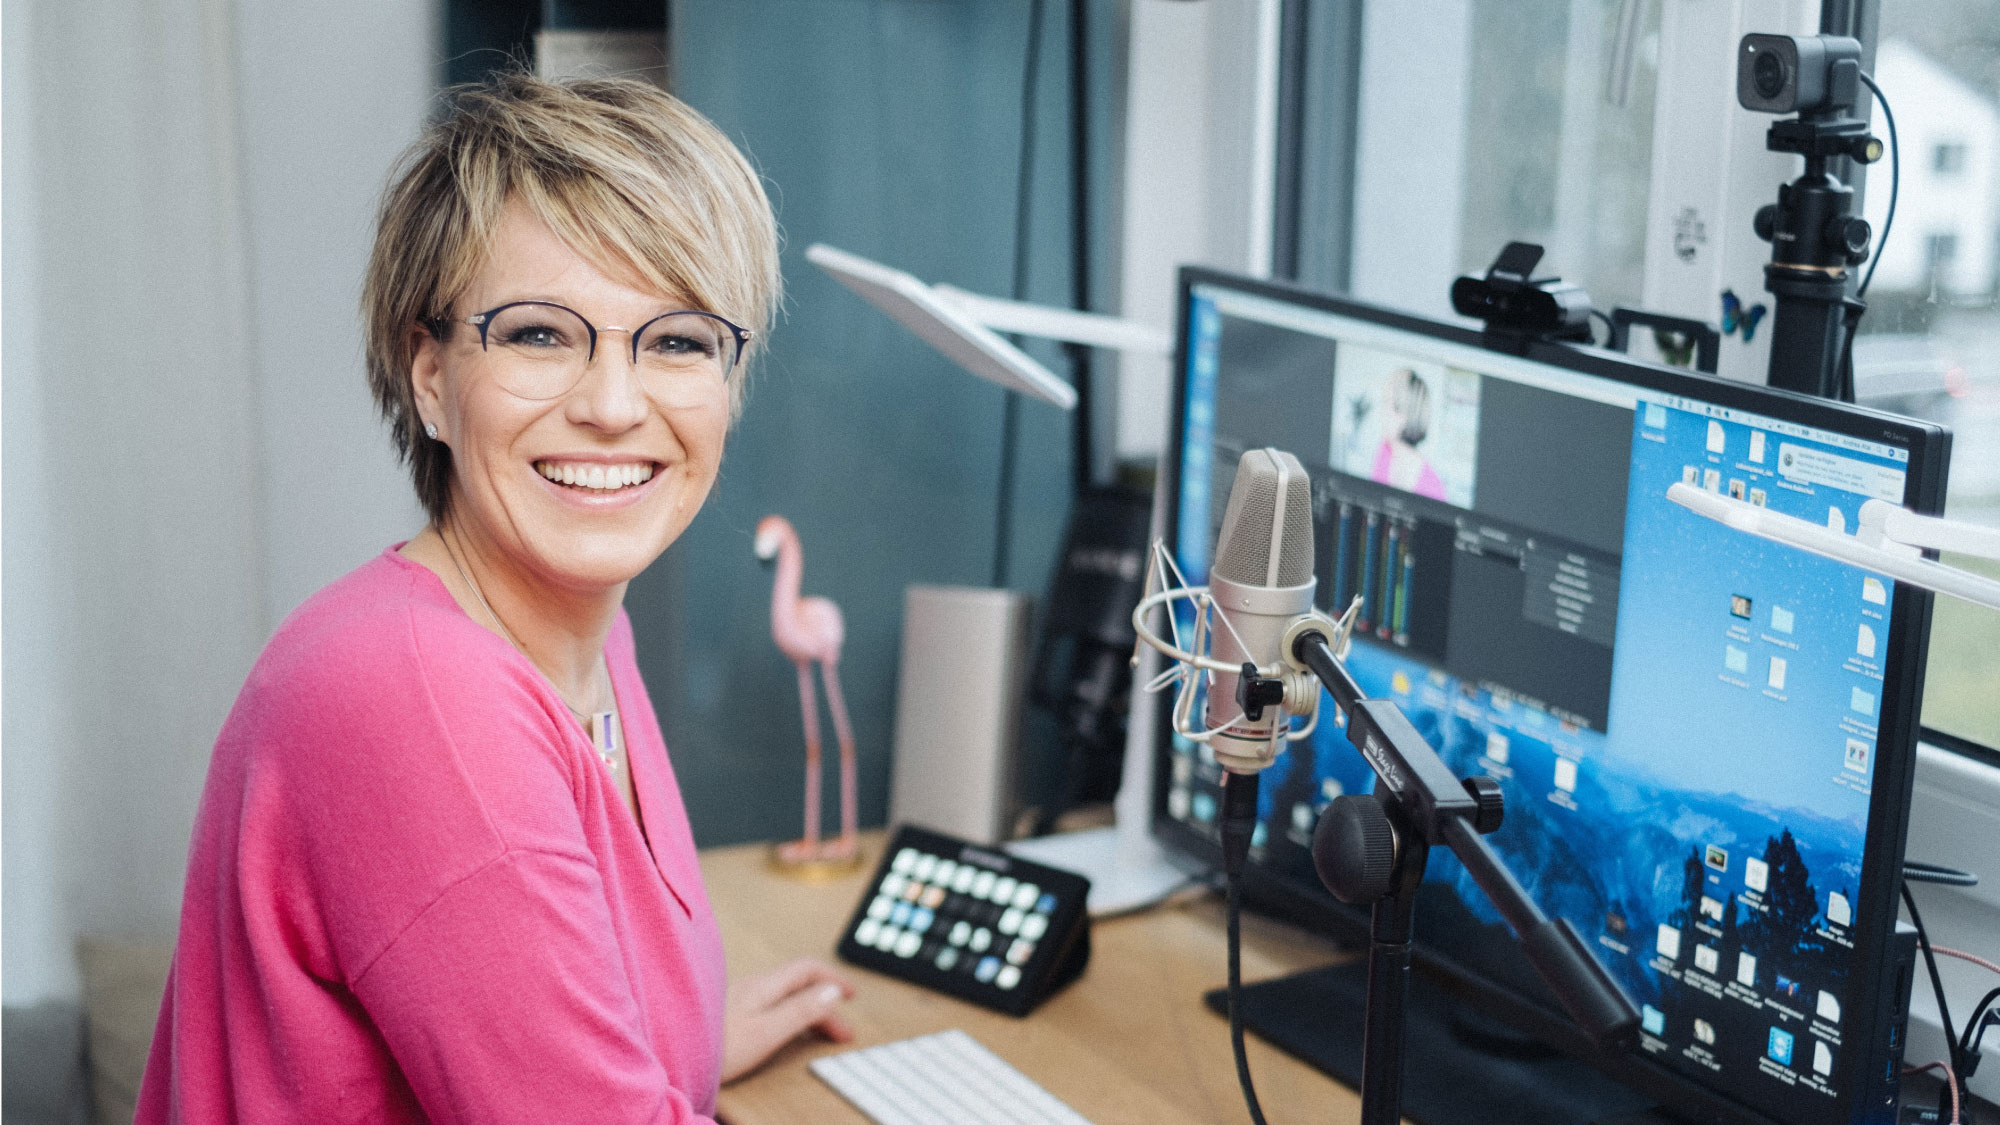 Video Masterclass - Das ultimative Videocoaching-Programm mit Andrea Ballschuh